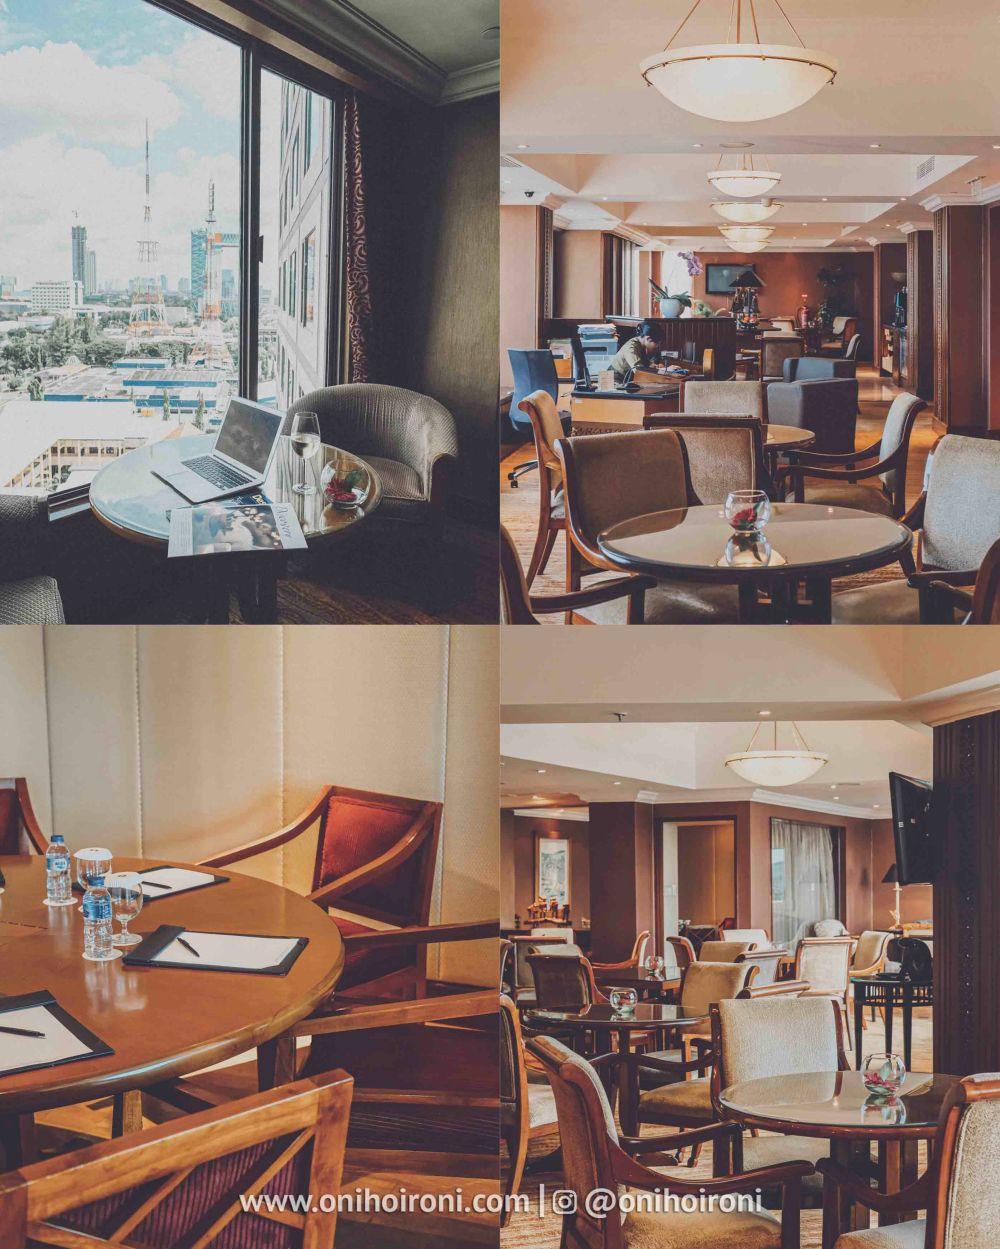 1 Review Horizon Club Lounge Shangrila Surabaya Hotel Oni hoironi